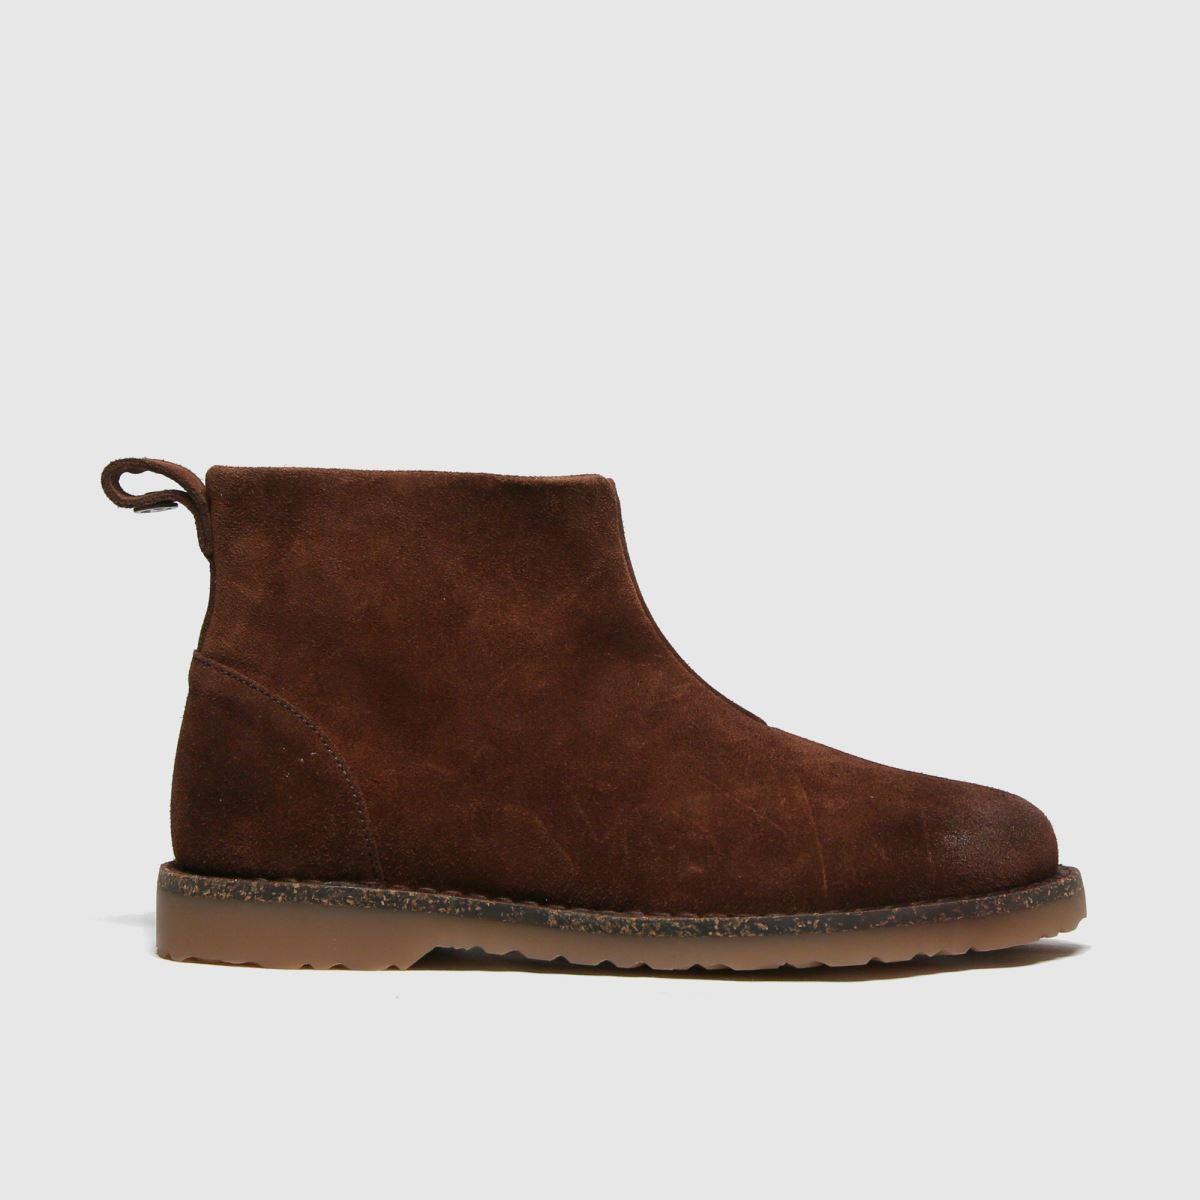 Birkenstock Brown Melrose Boots